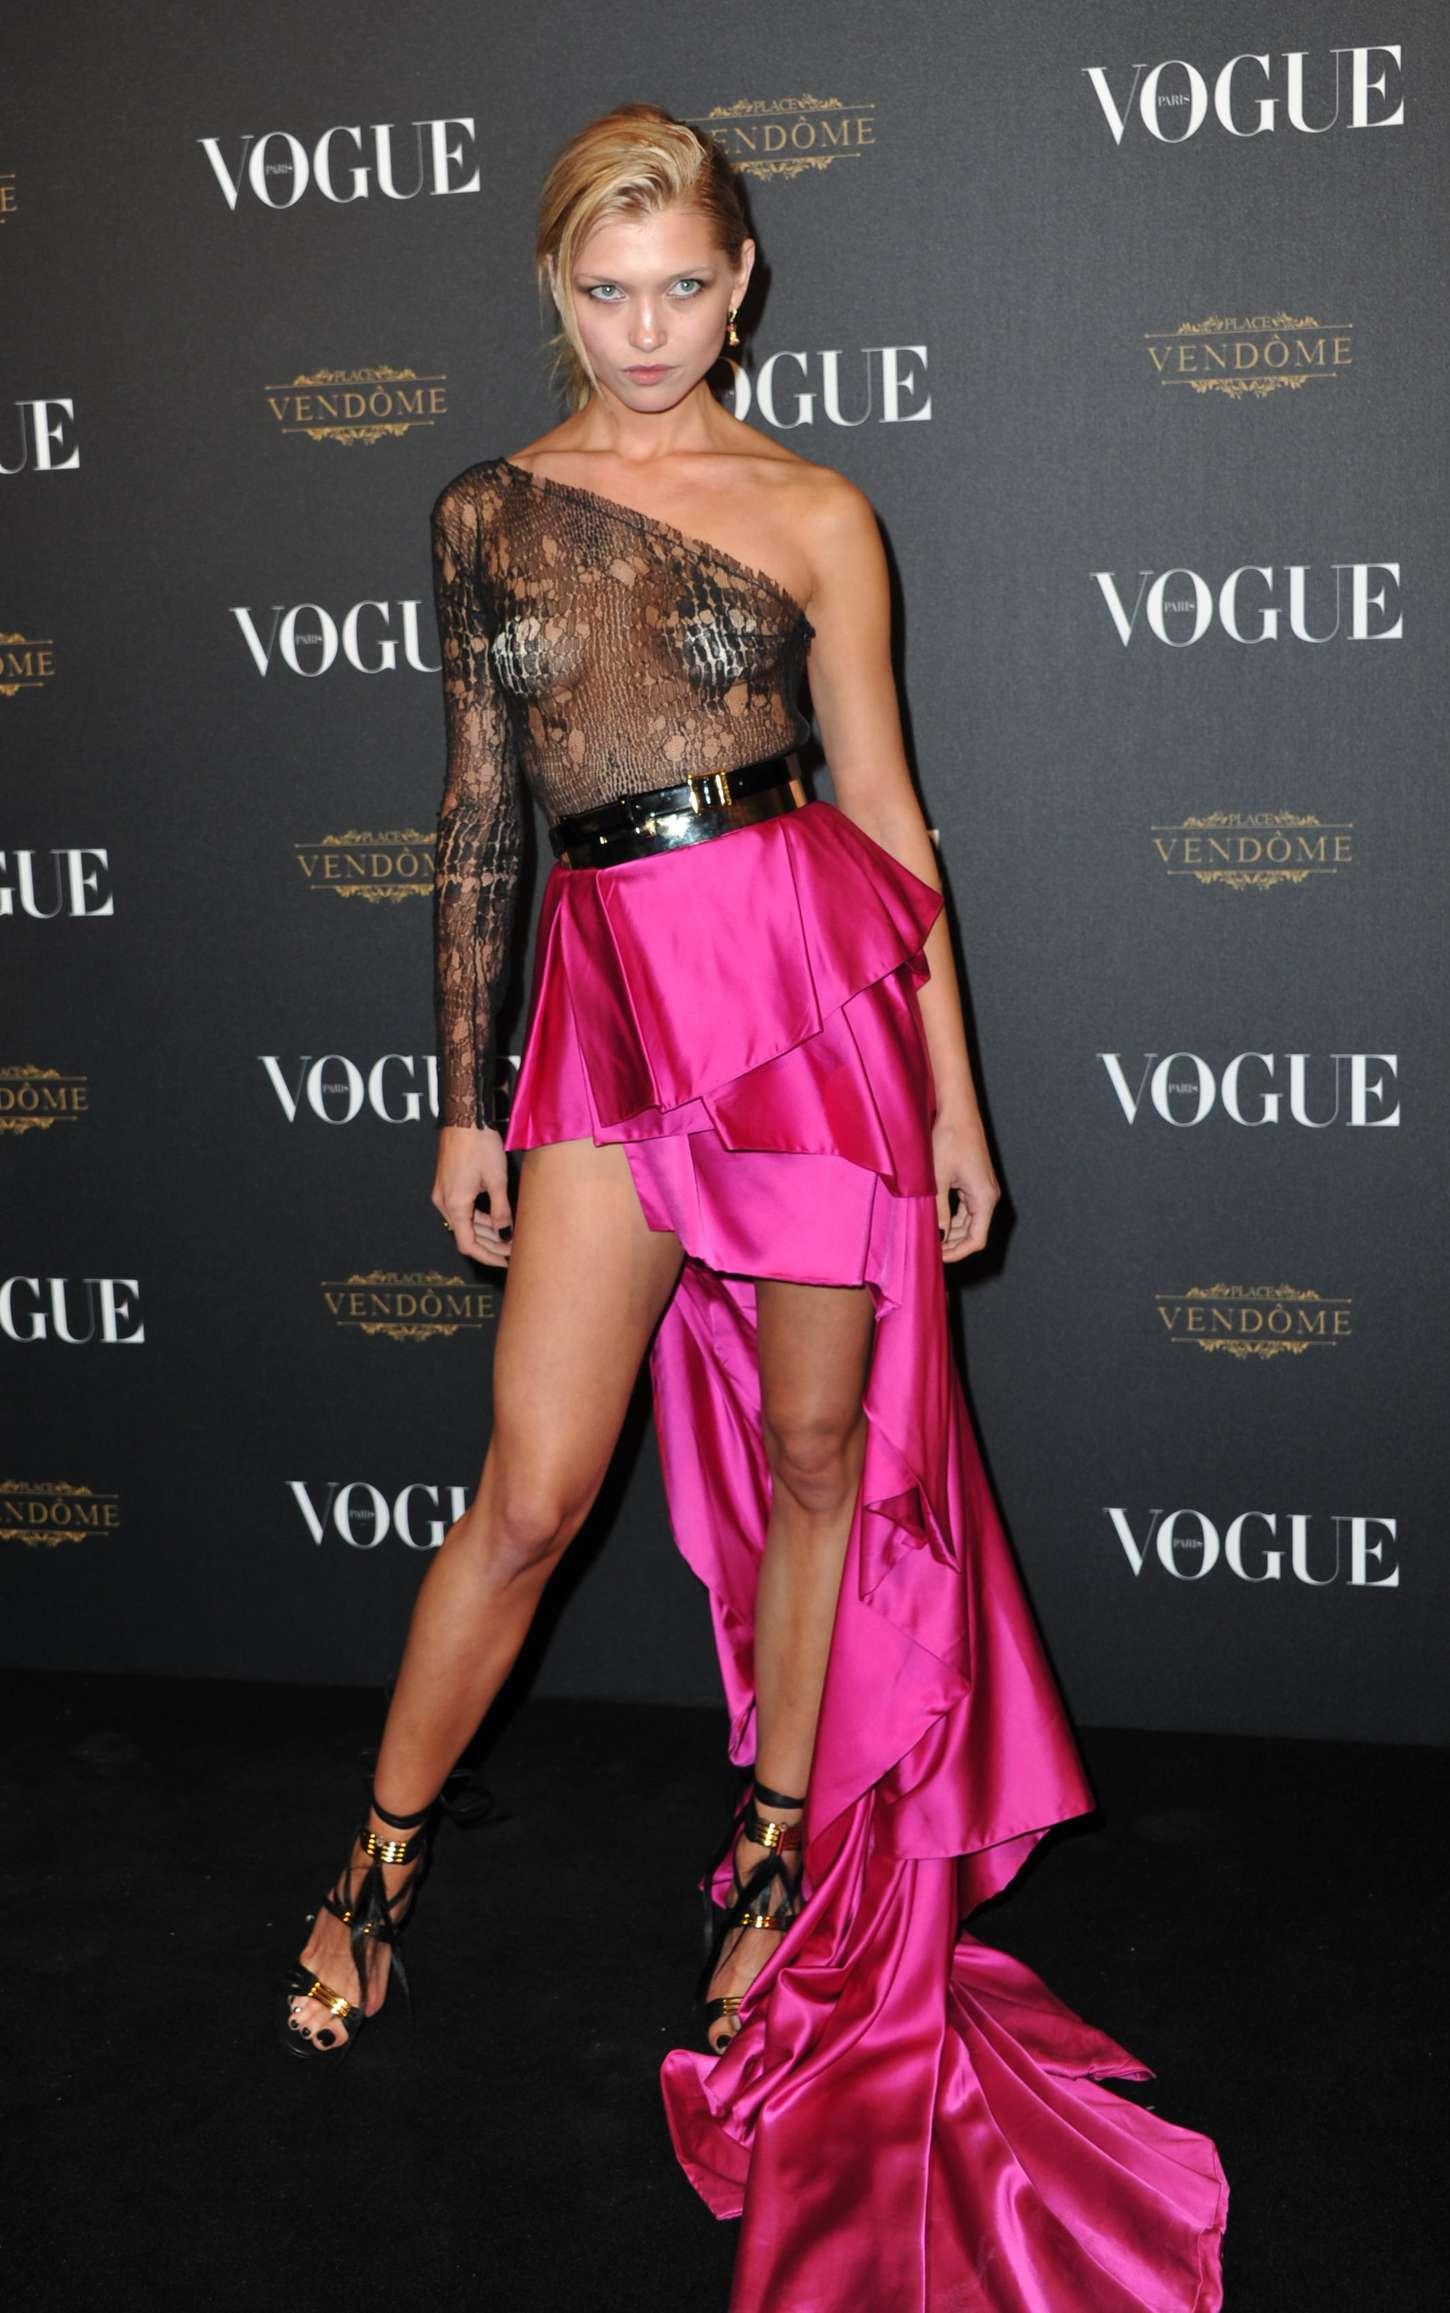 Hana Jirickova Vogue Anniversary Party in Paris